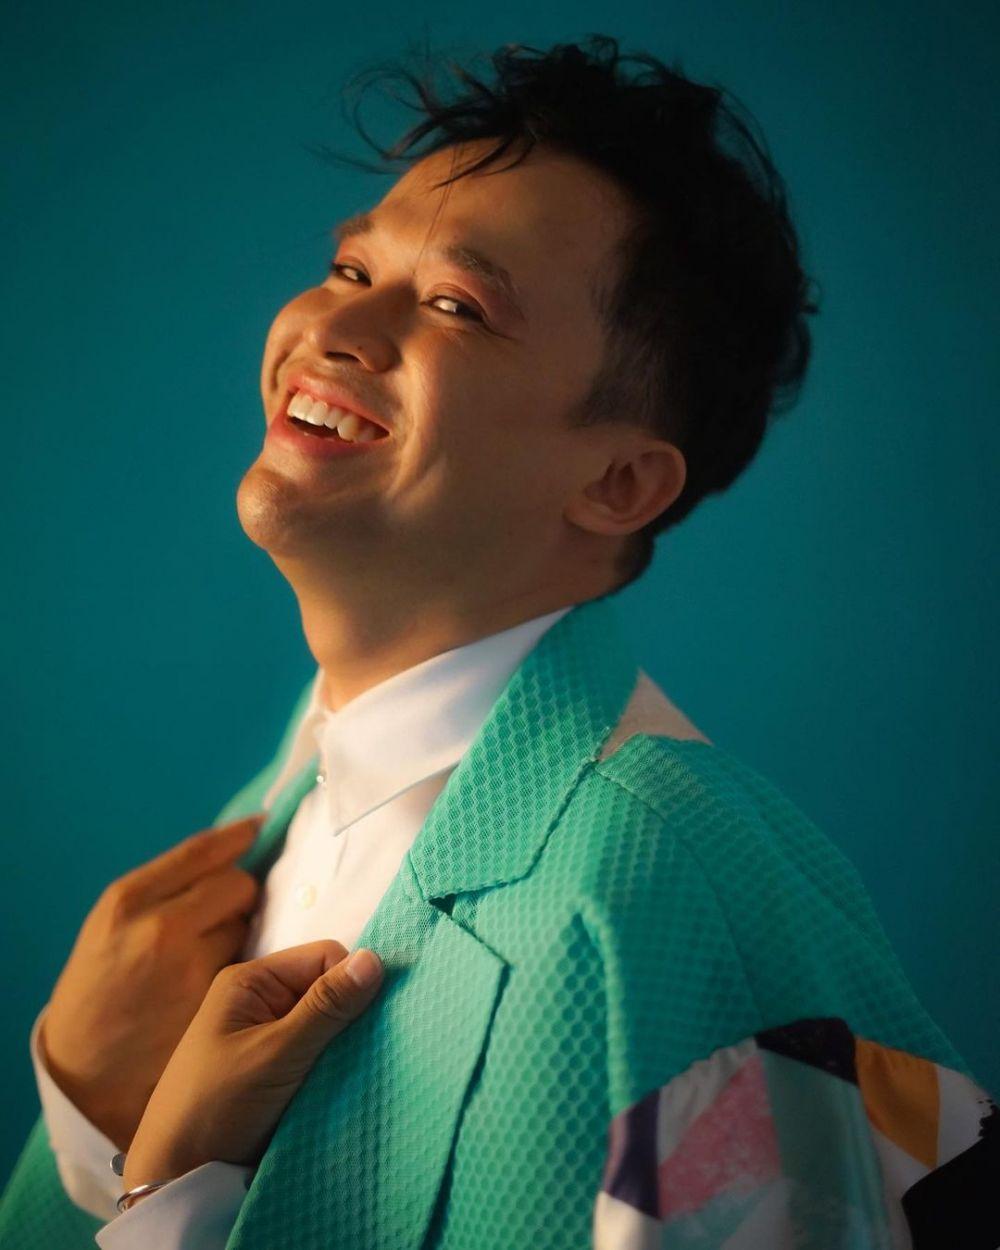 gaya Anwar Sanjaya saat pemotretan © 2021 brilio.net